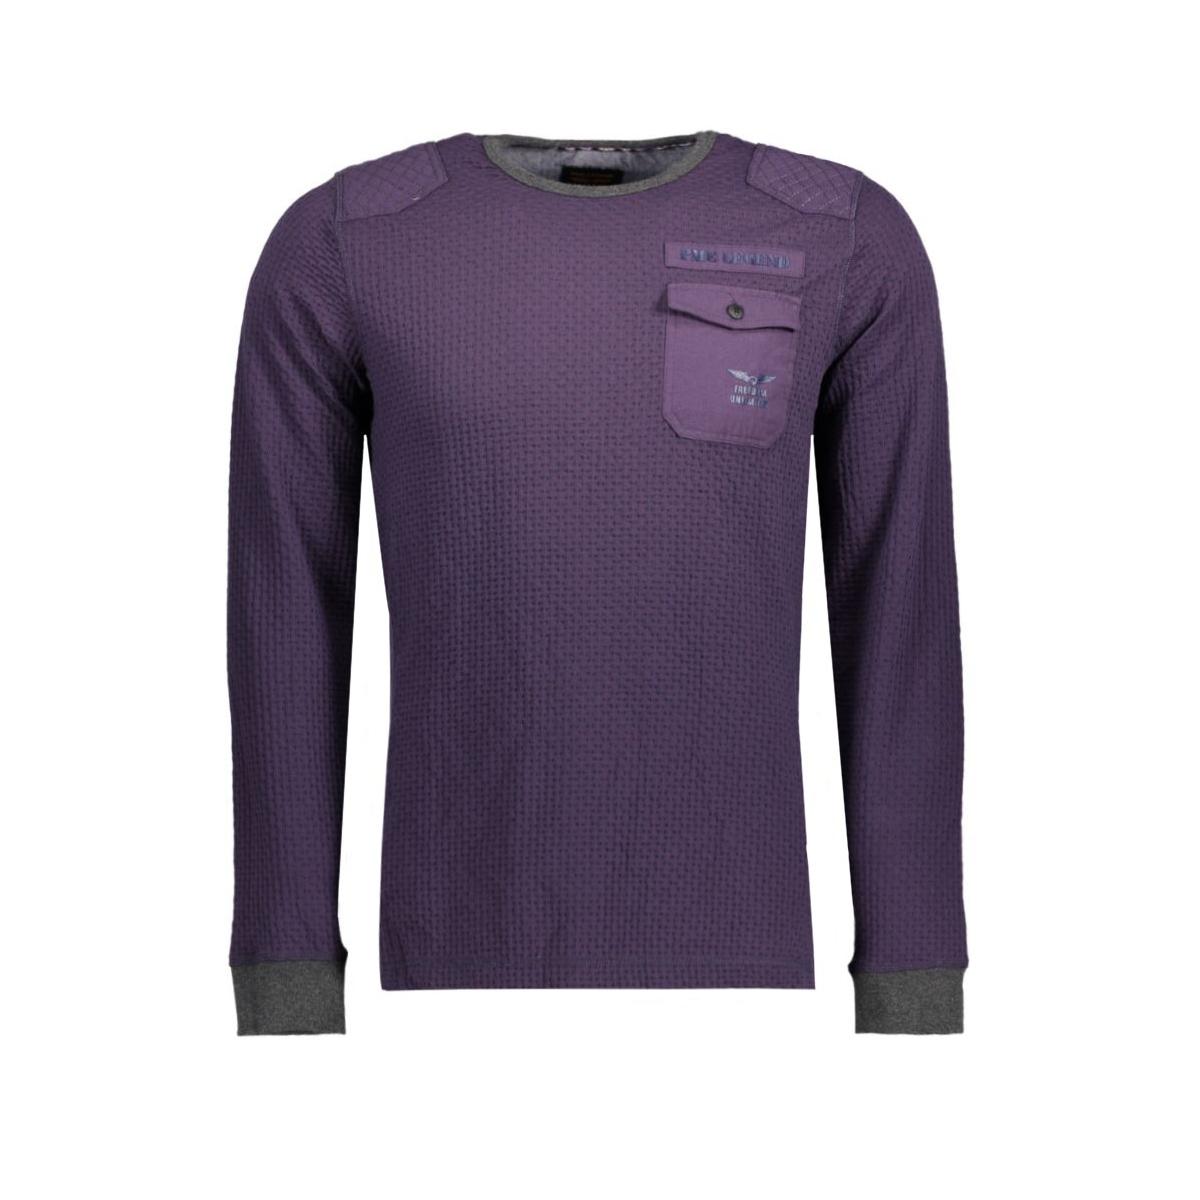 pts67516 pme legend t-shirt 5925